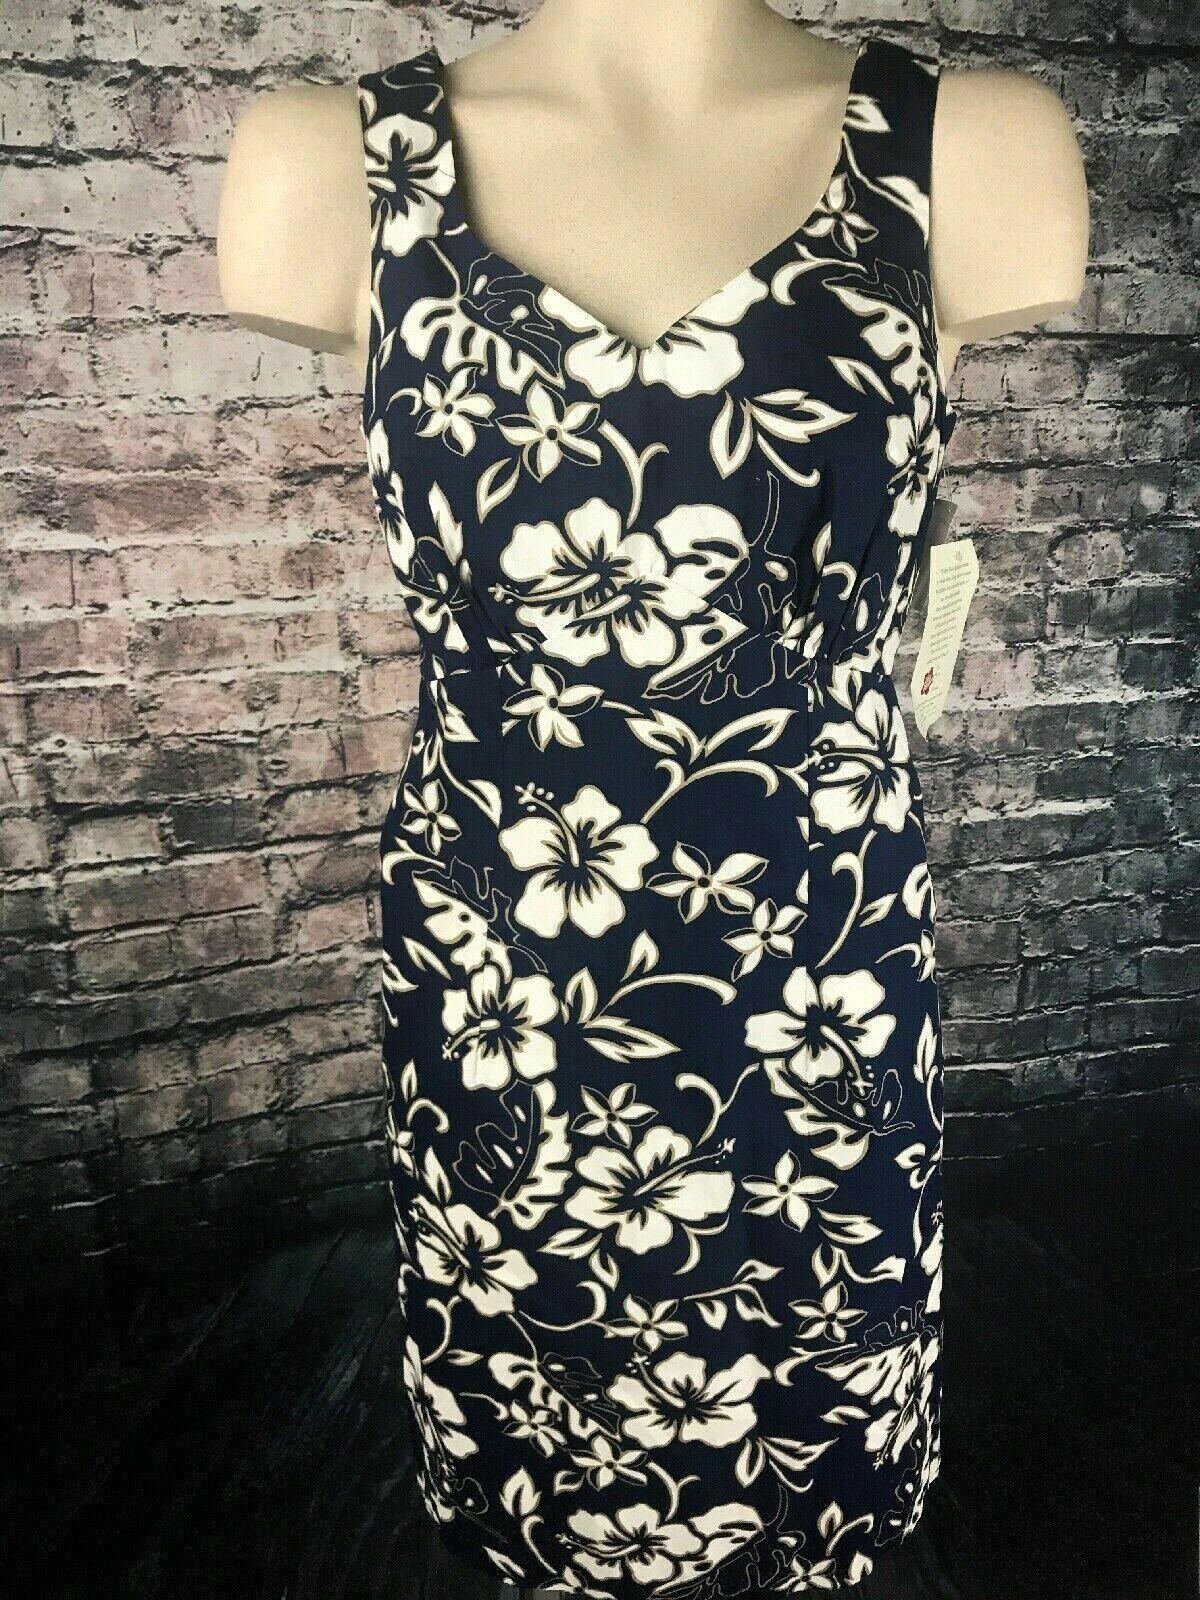 Hilo Hattie the Hawaiian original Women size 8 Dress Dark Blue White Floral NWT